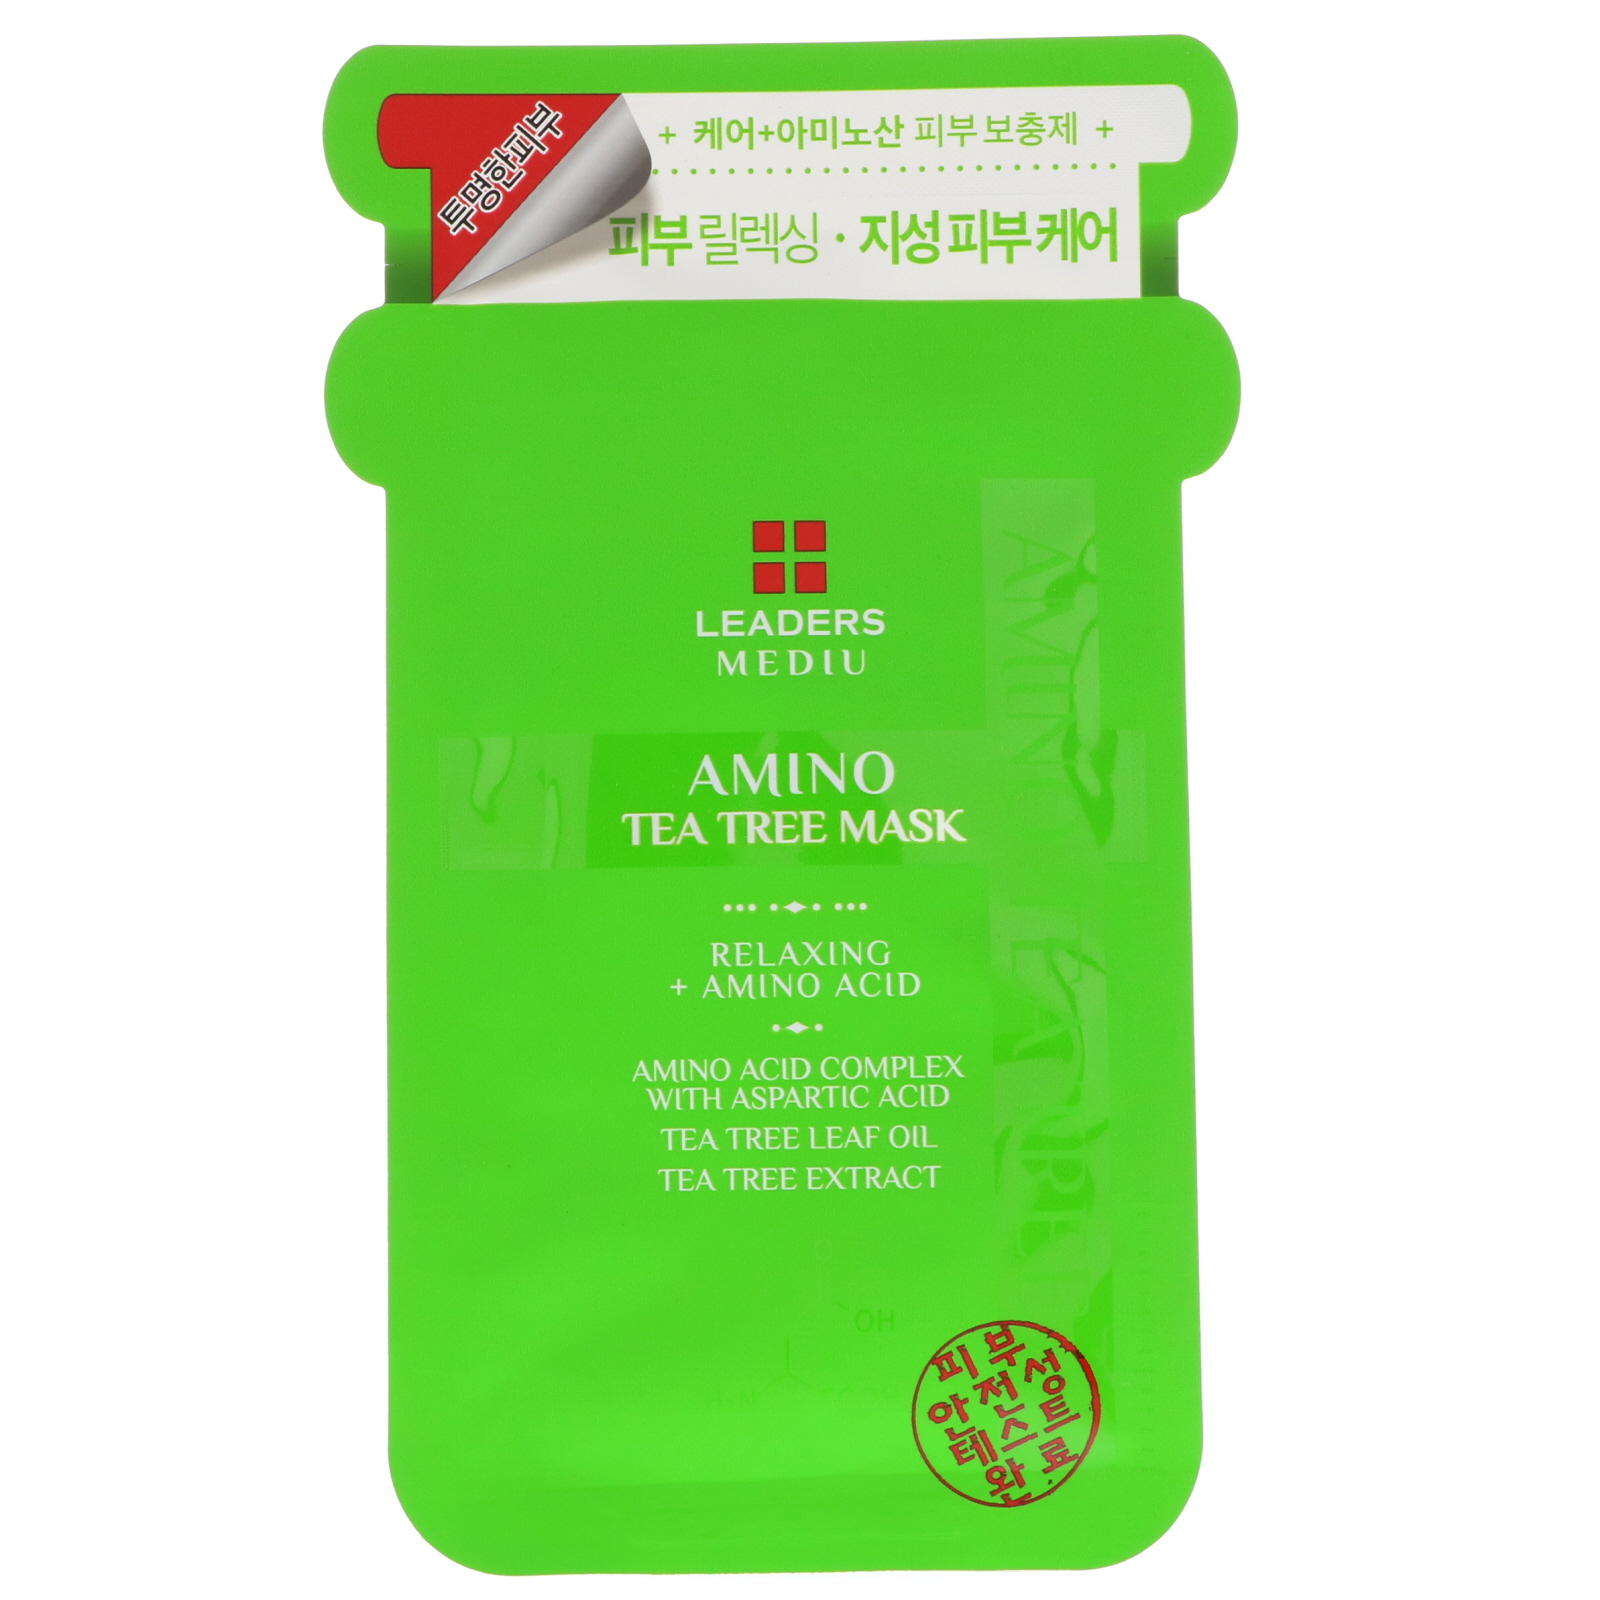 Leaders, Mediu, Amino Clearing Mask, 1 Mask, 25 ml(pack of 6) Hawaiian Tropic Silk Hydration Faces Lotion, SPF 30, 1.7 oz